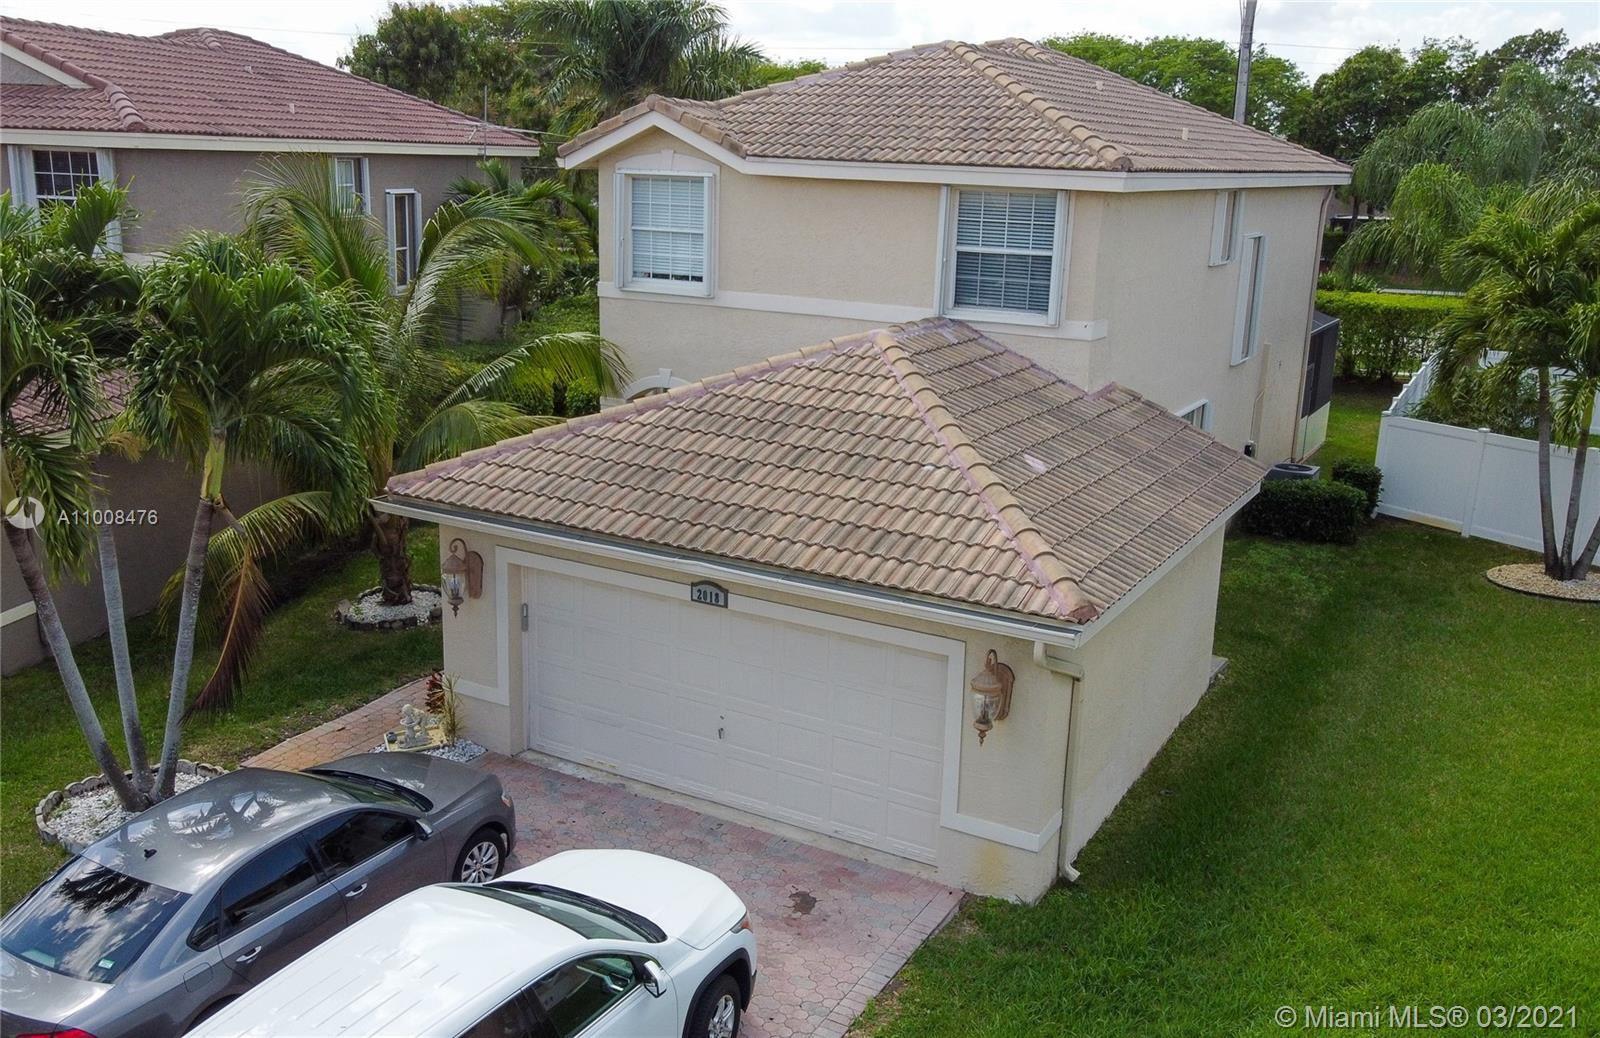 2018 SW 159 Terrace, Miramar, FL 33027 - #: A11008476